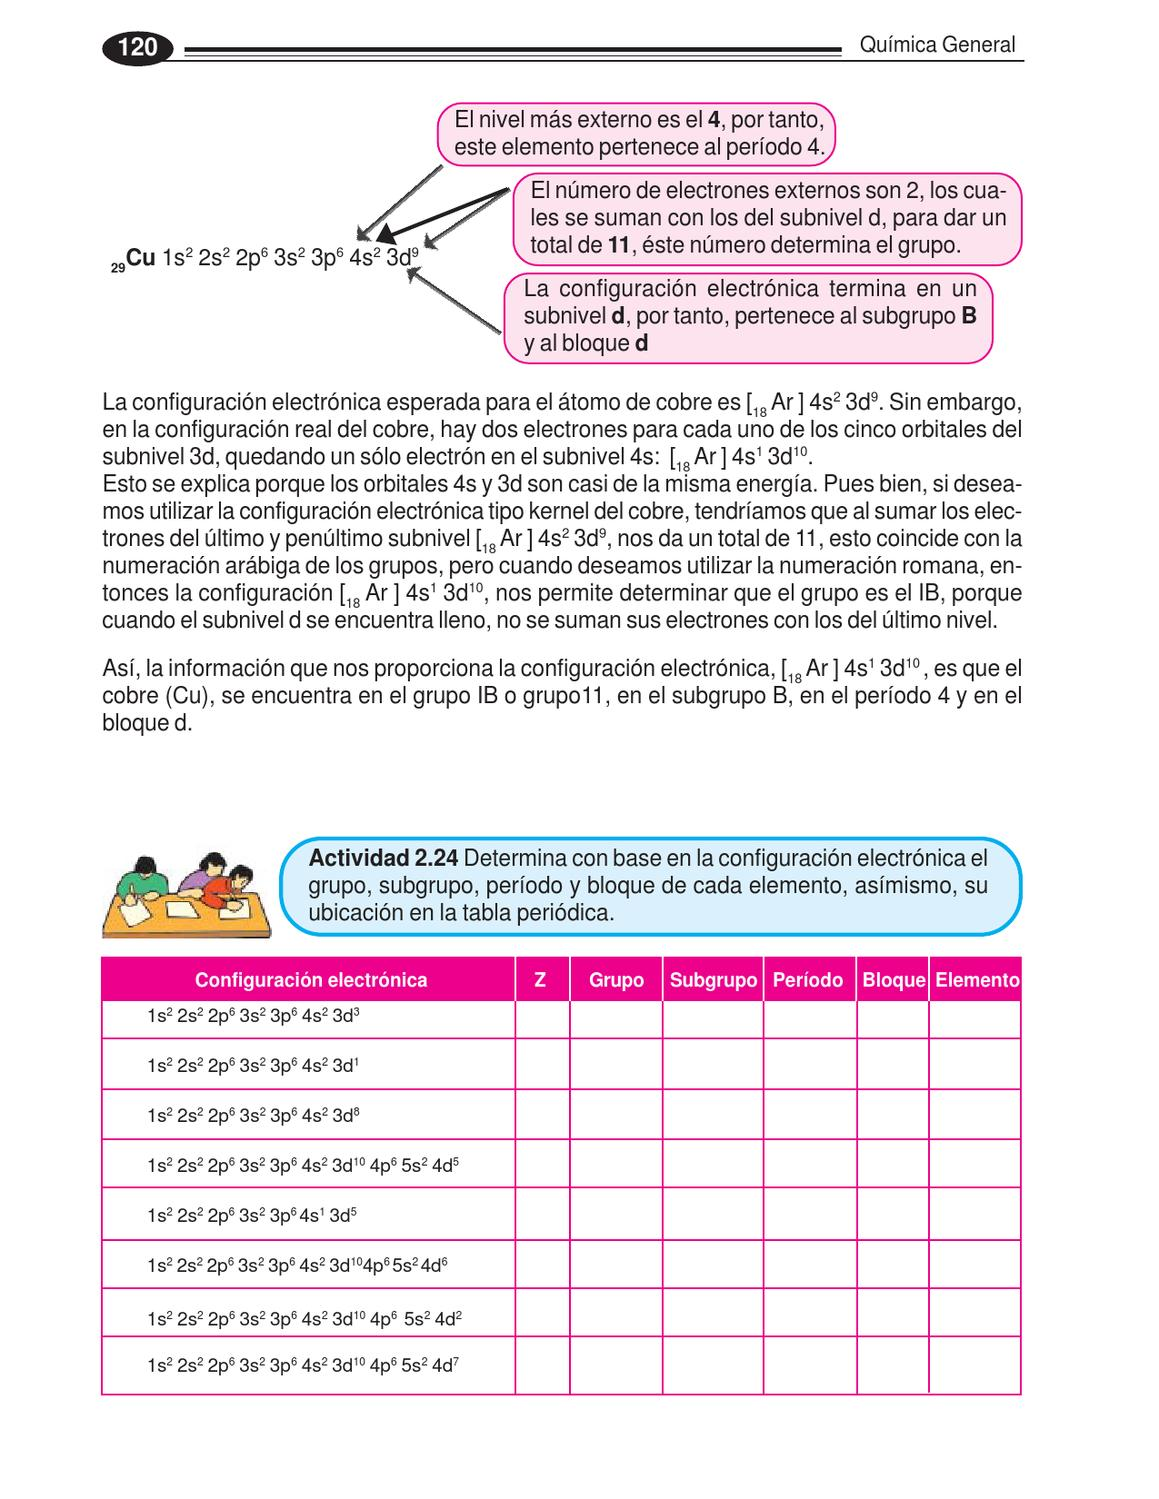 Libro de quimica by edson orozco bedugo issuu urtaz Gallery